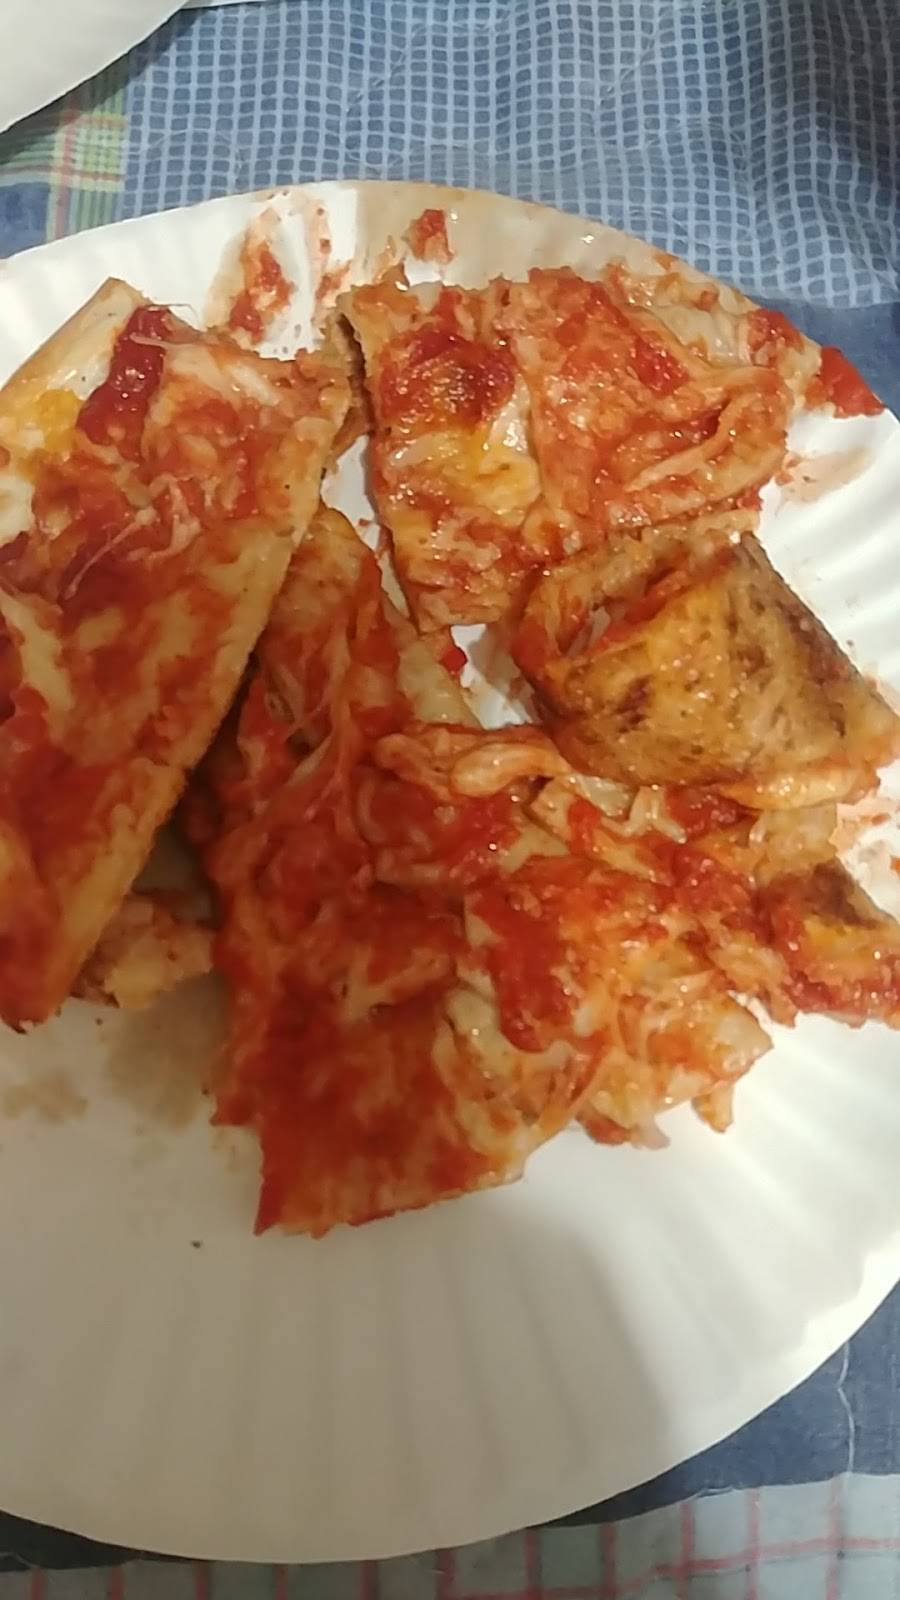 Salza Pizza   restaurant   73-17 Woodside Ave, Woodside, NY 11377, USA   7186061919 OR +1 718-606-1919